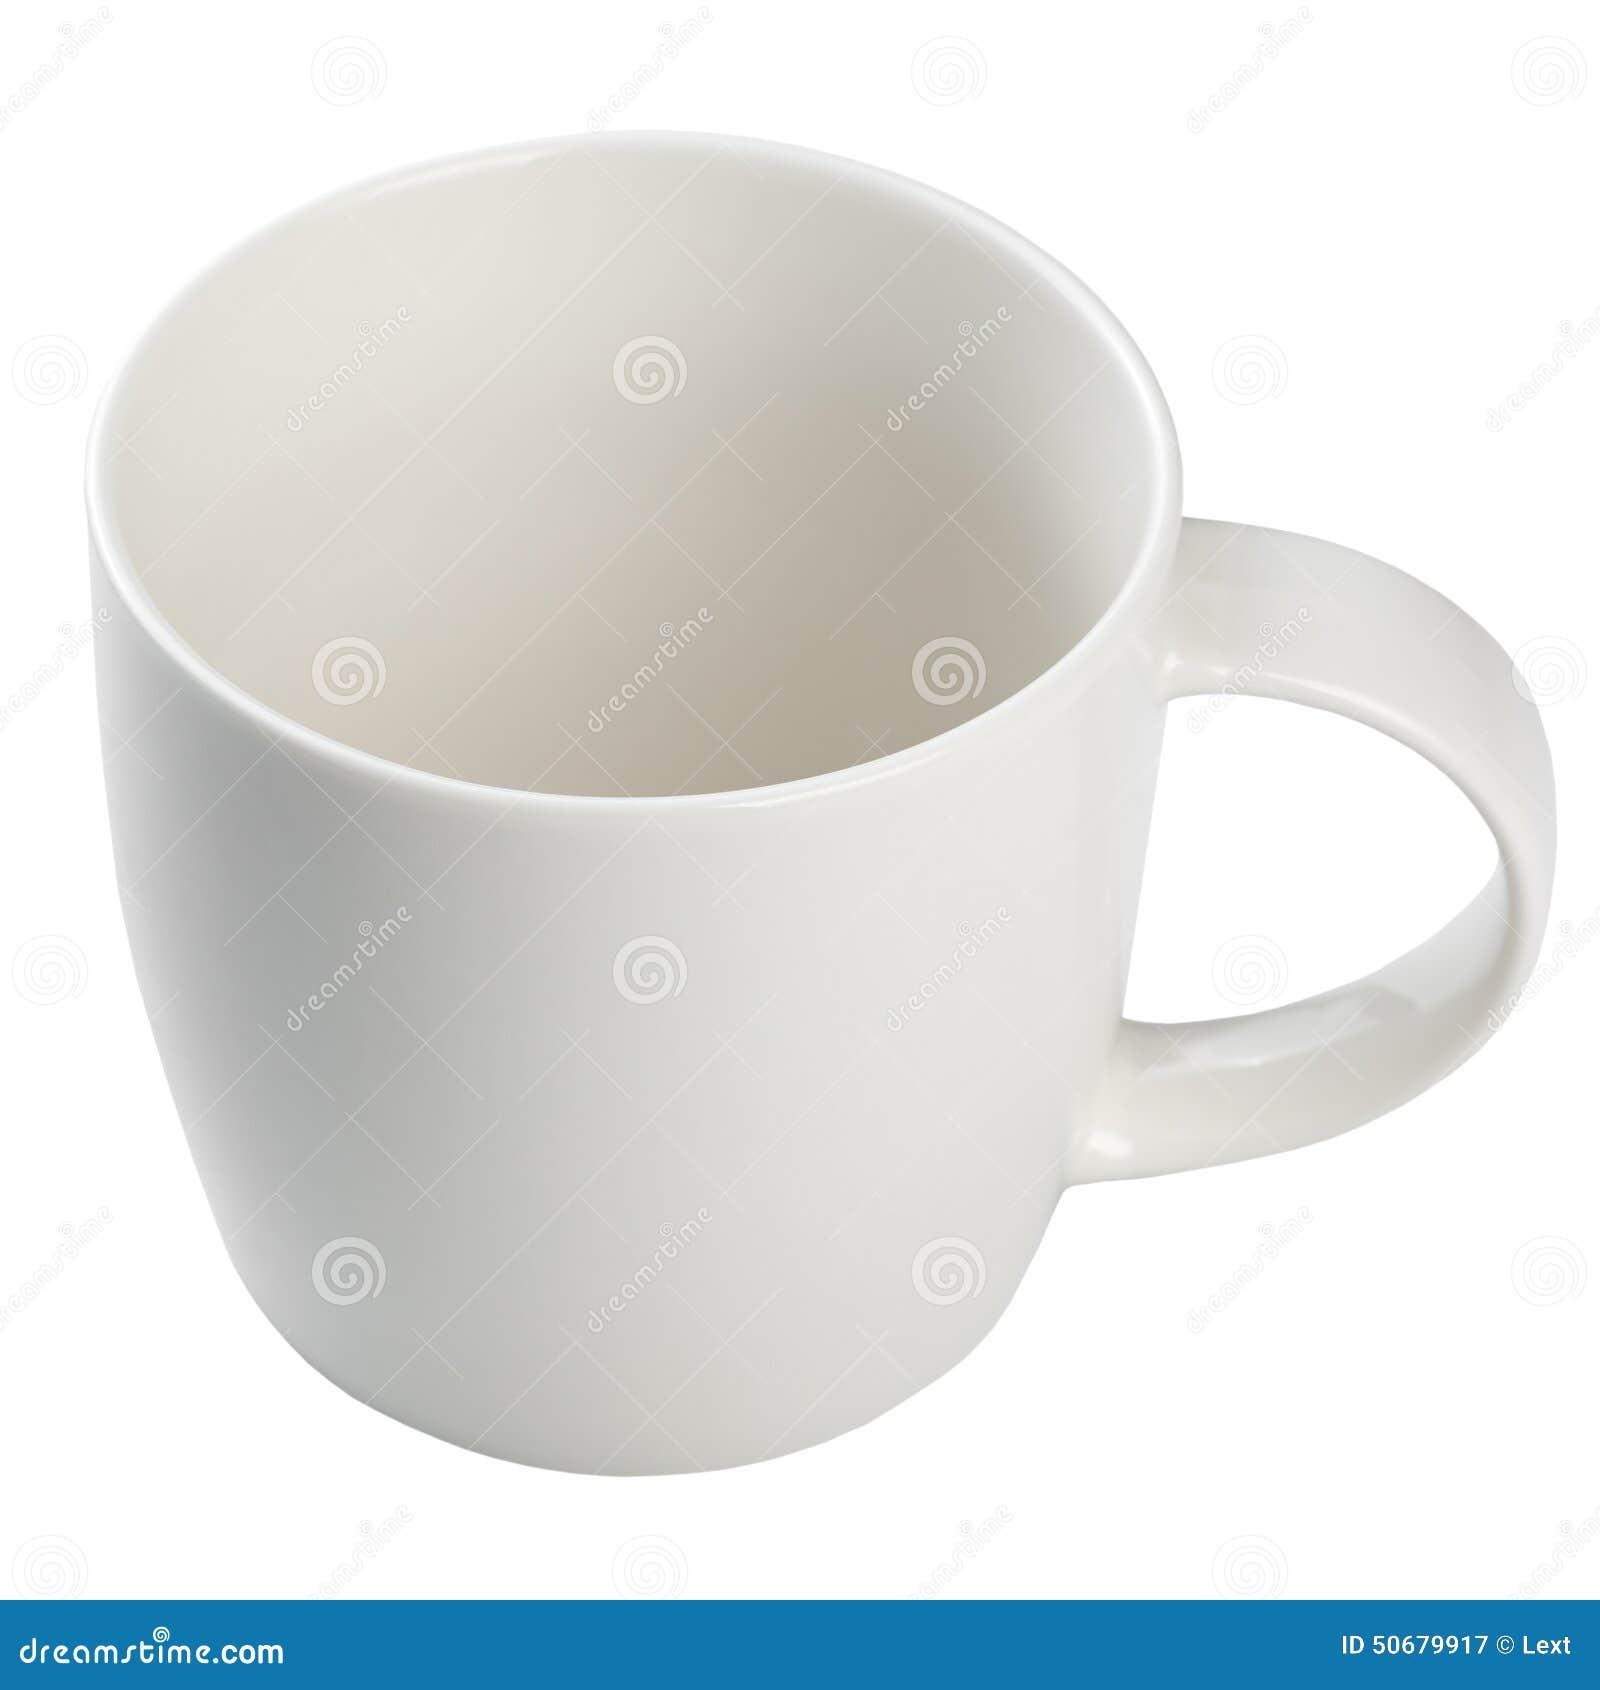 Download 被隔绝的空的咖啡杯 库存图片. 图片 包括有 制动手, 照亮, 杯子, 传统, 下午茶时间, 经典, 简单 - 50679917